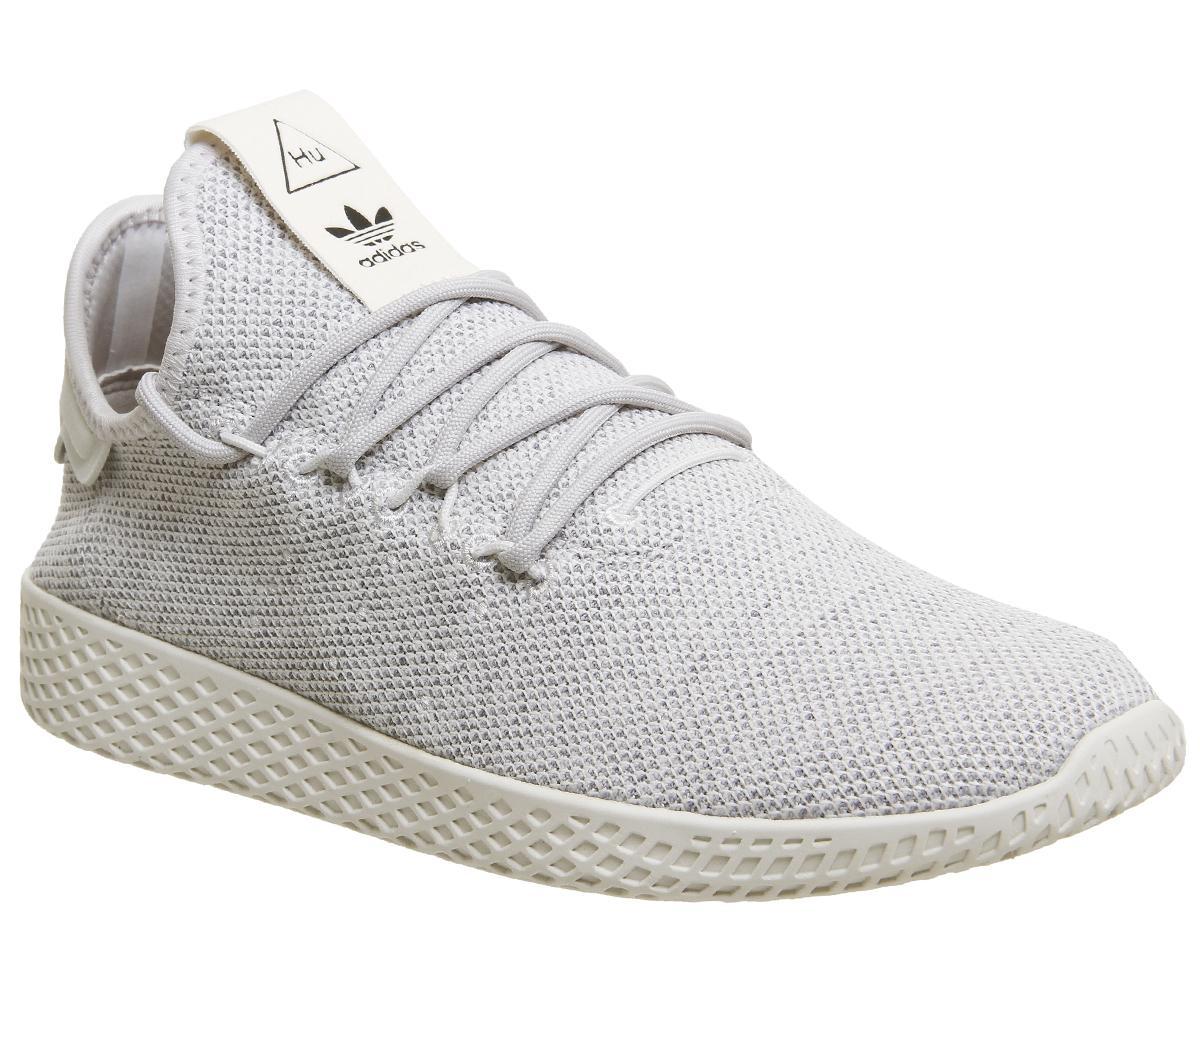 3dbaefd1a9305 Adidas Pw Tennis Trainers Grey One Chalk White - Unisex Sports